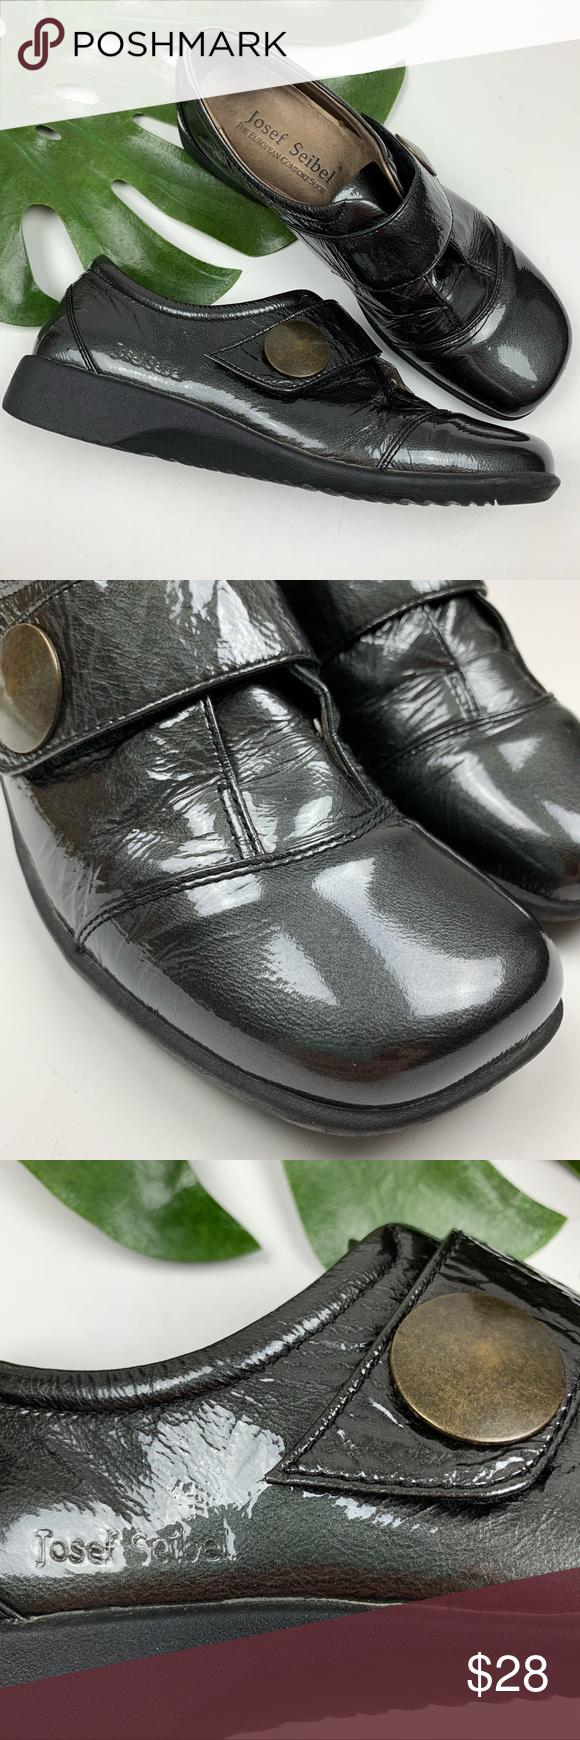 f66014d2 Josef Seibel Patent Leather Shoes 38 US 7.5 Josef Seibel women's patent  leather shoes in size